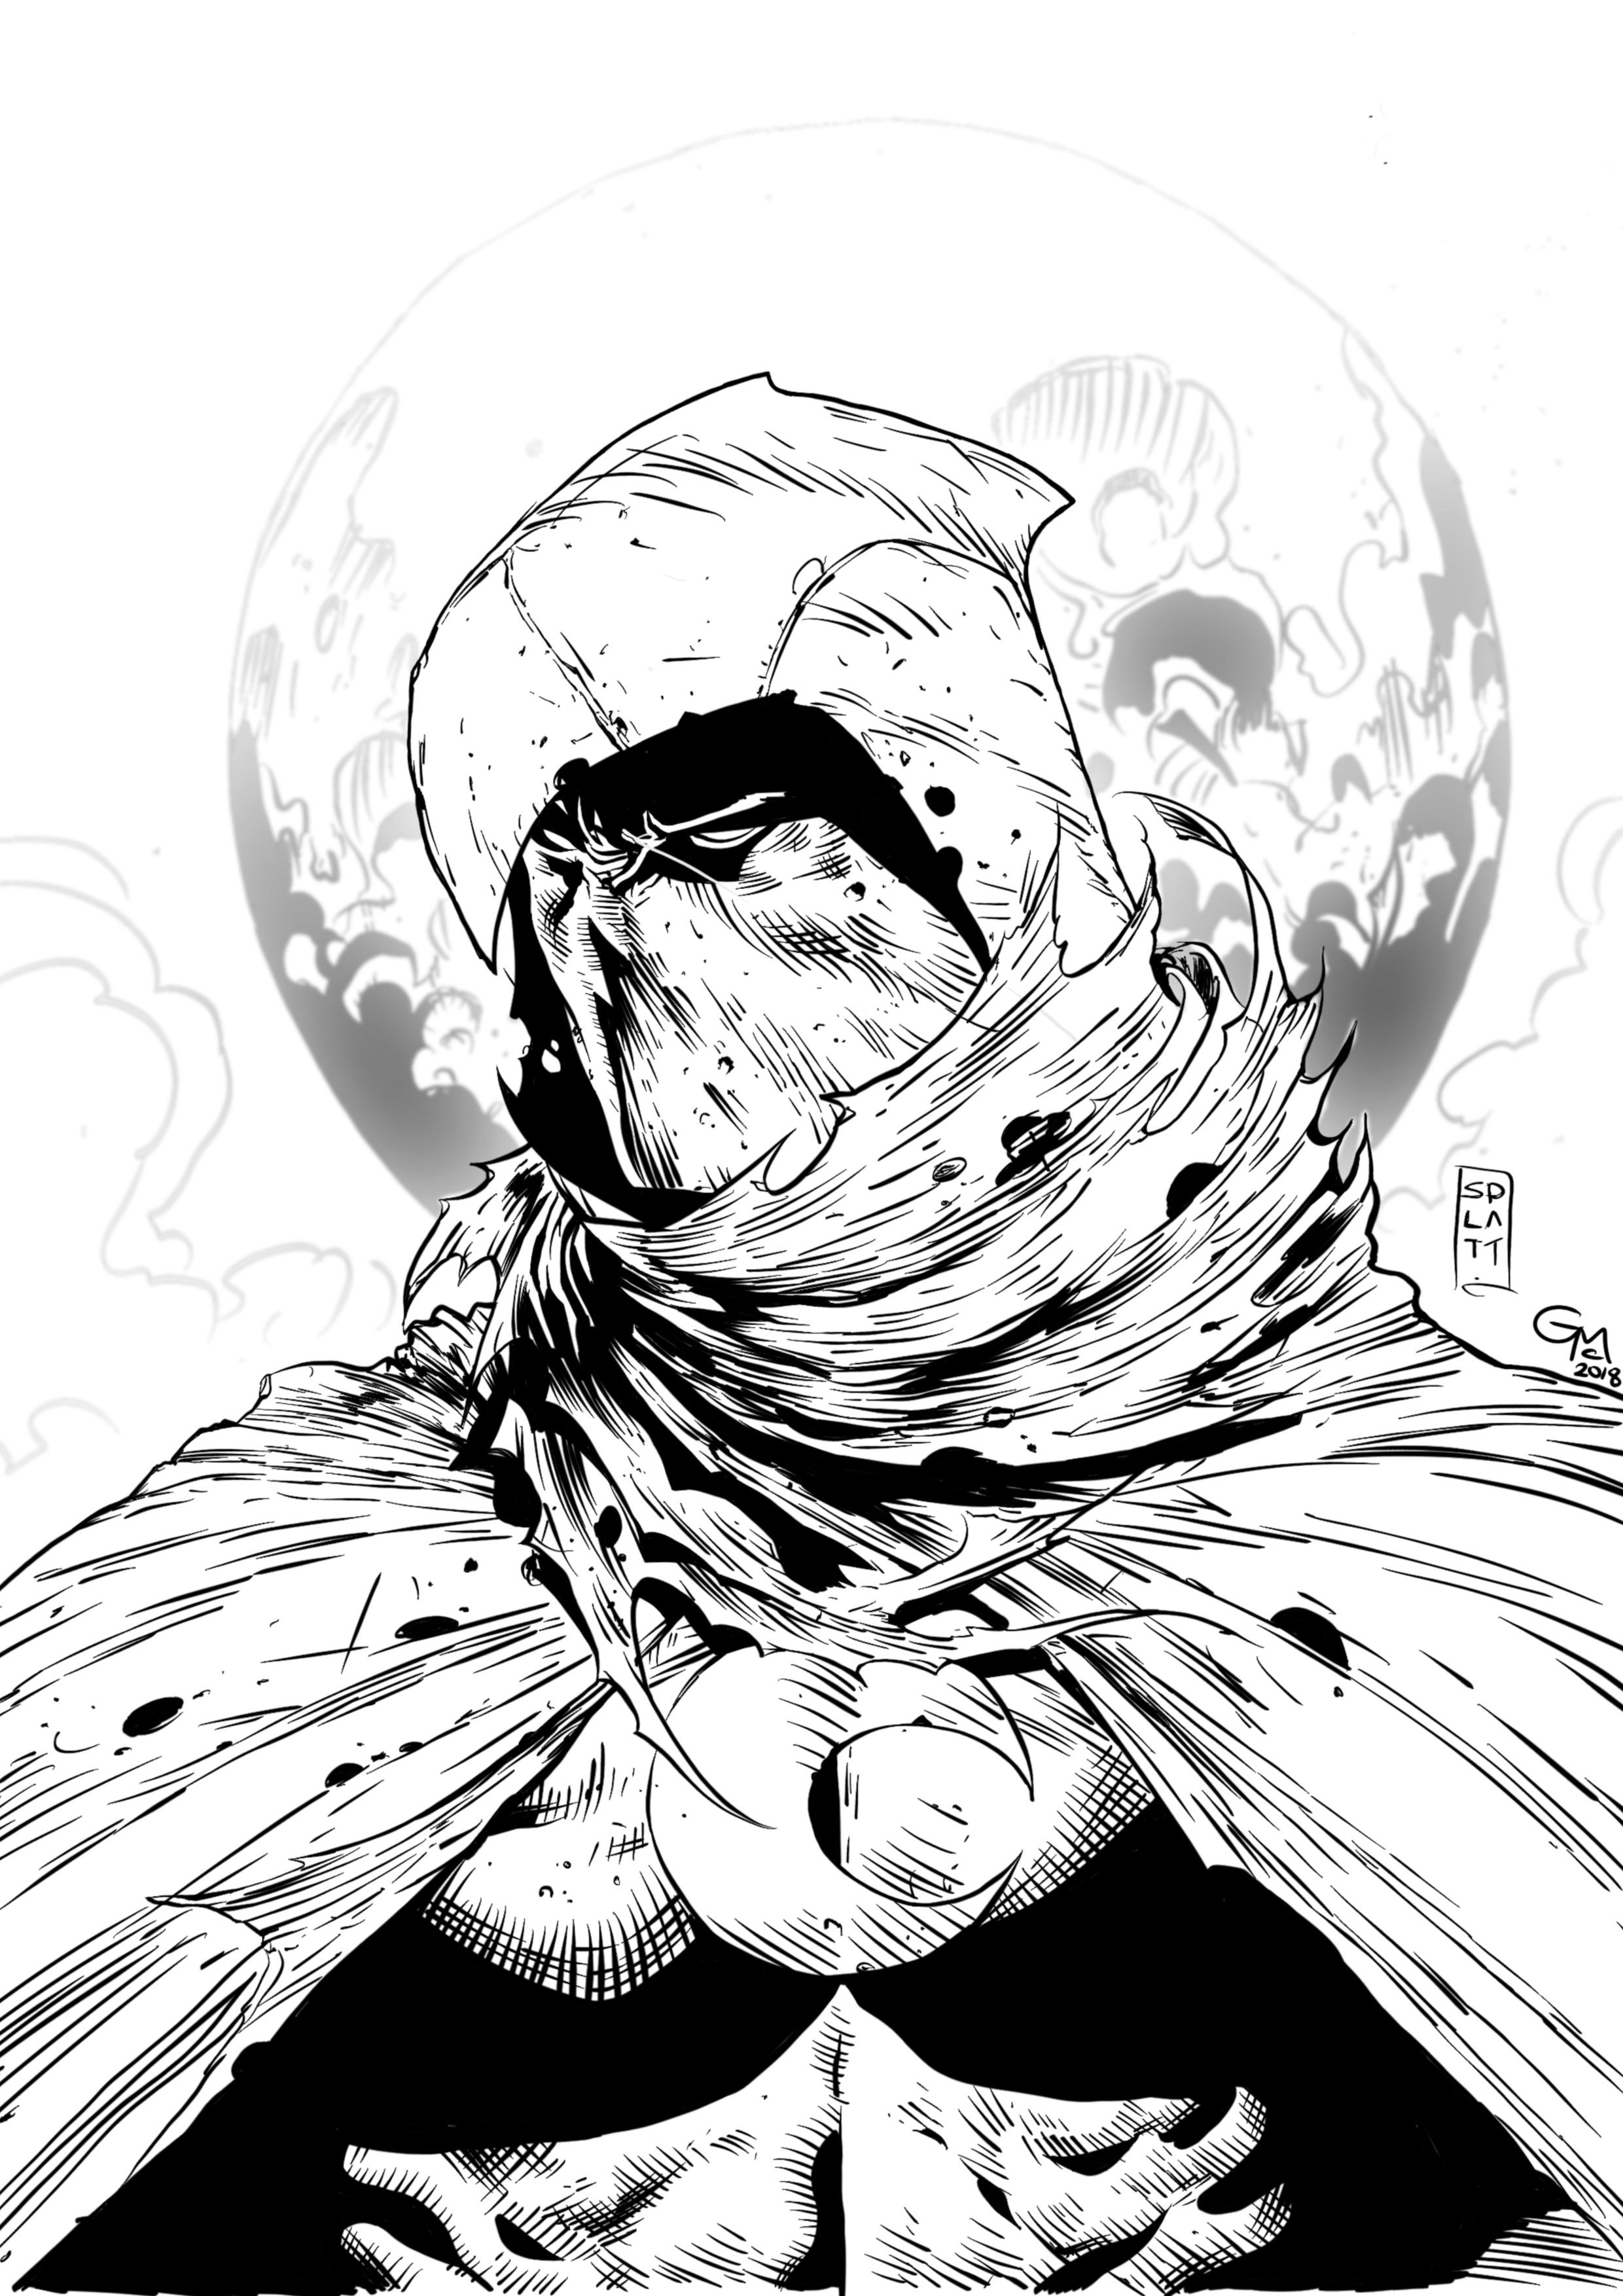 Moon Knight - My inks over the amazing pencilwork of Stephen Platt